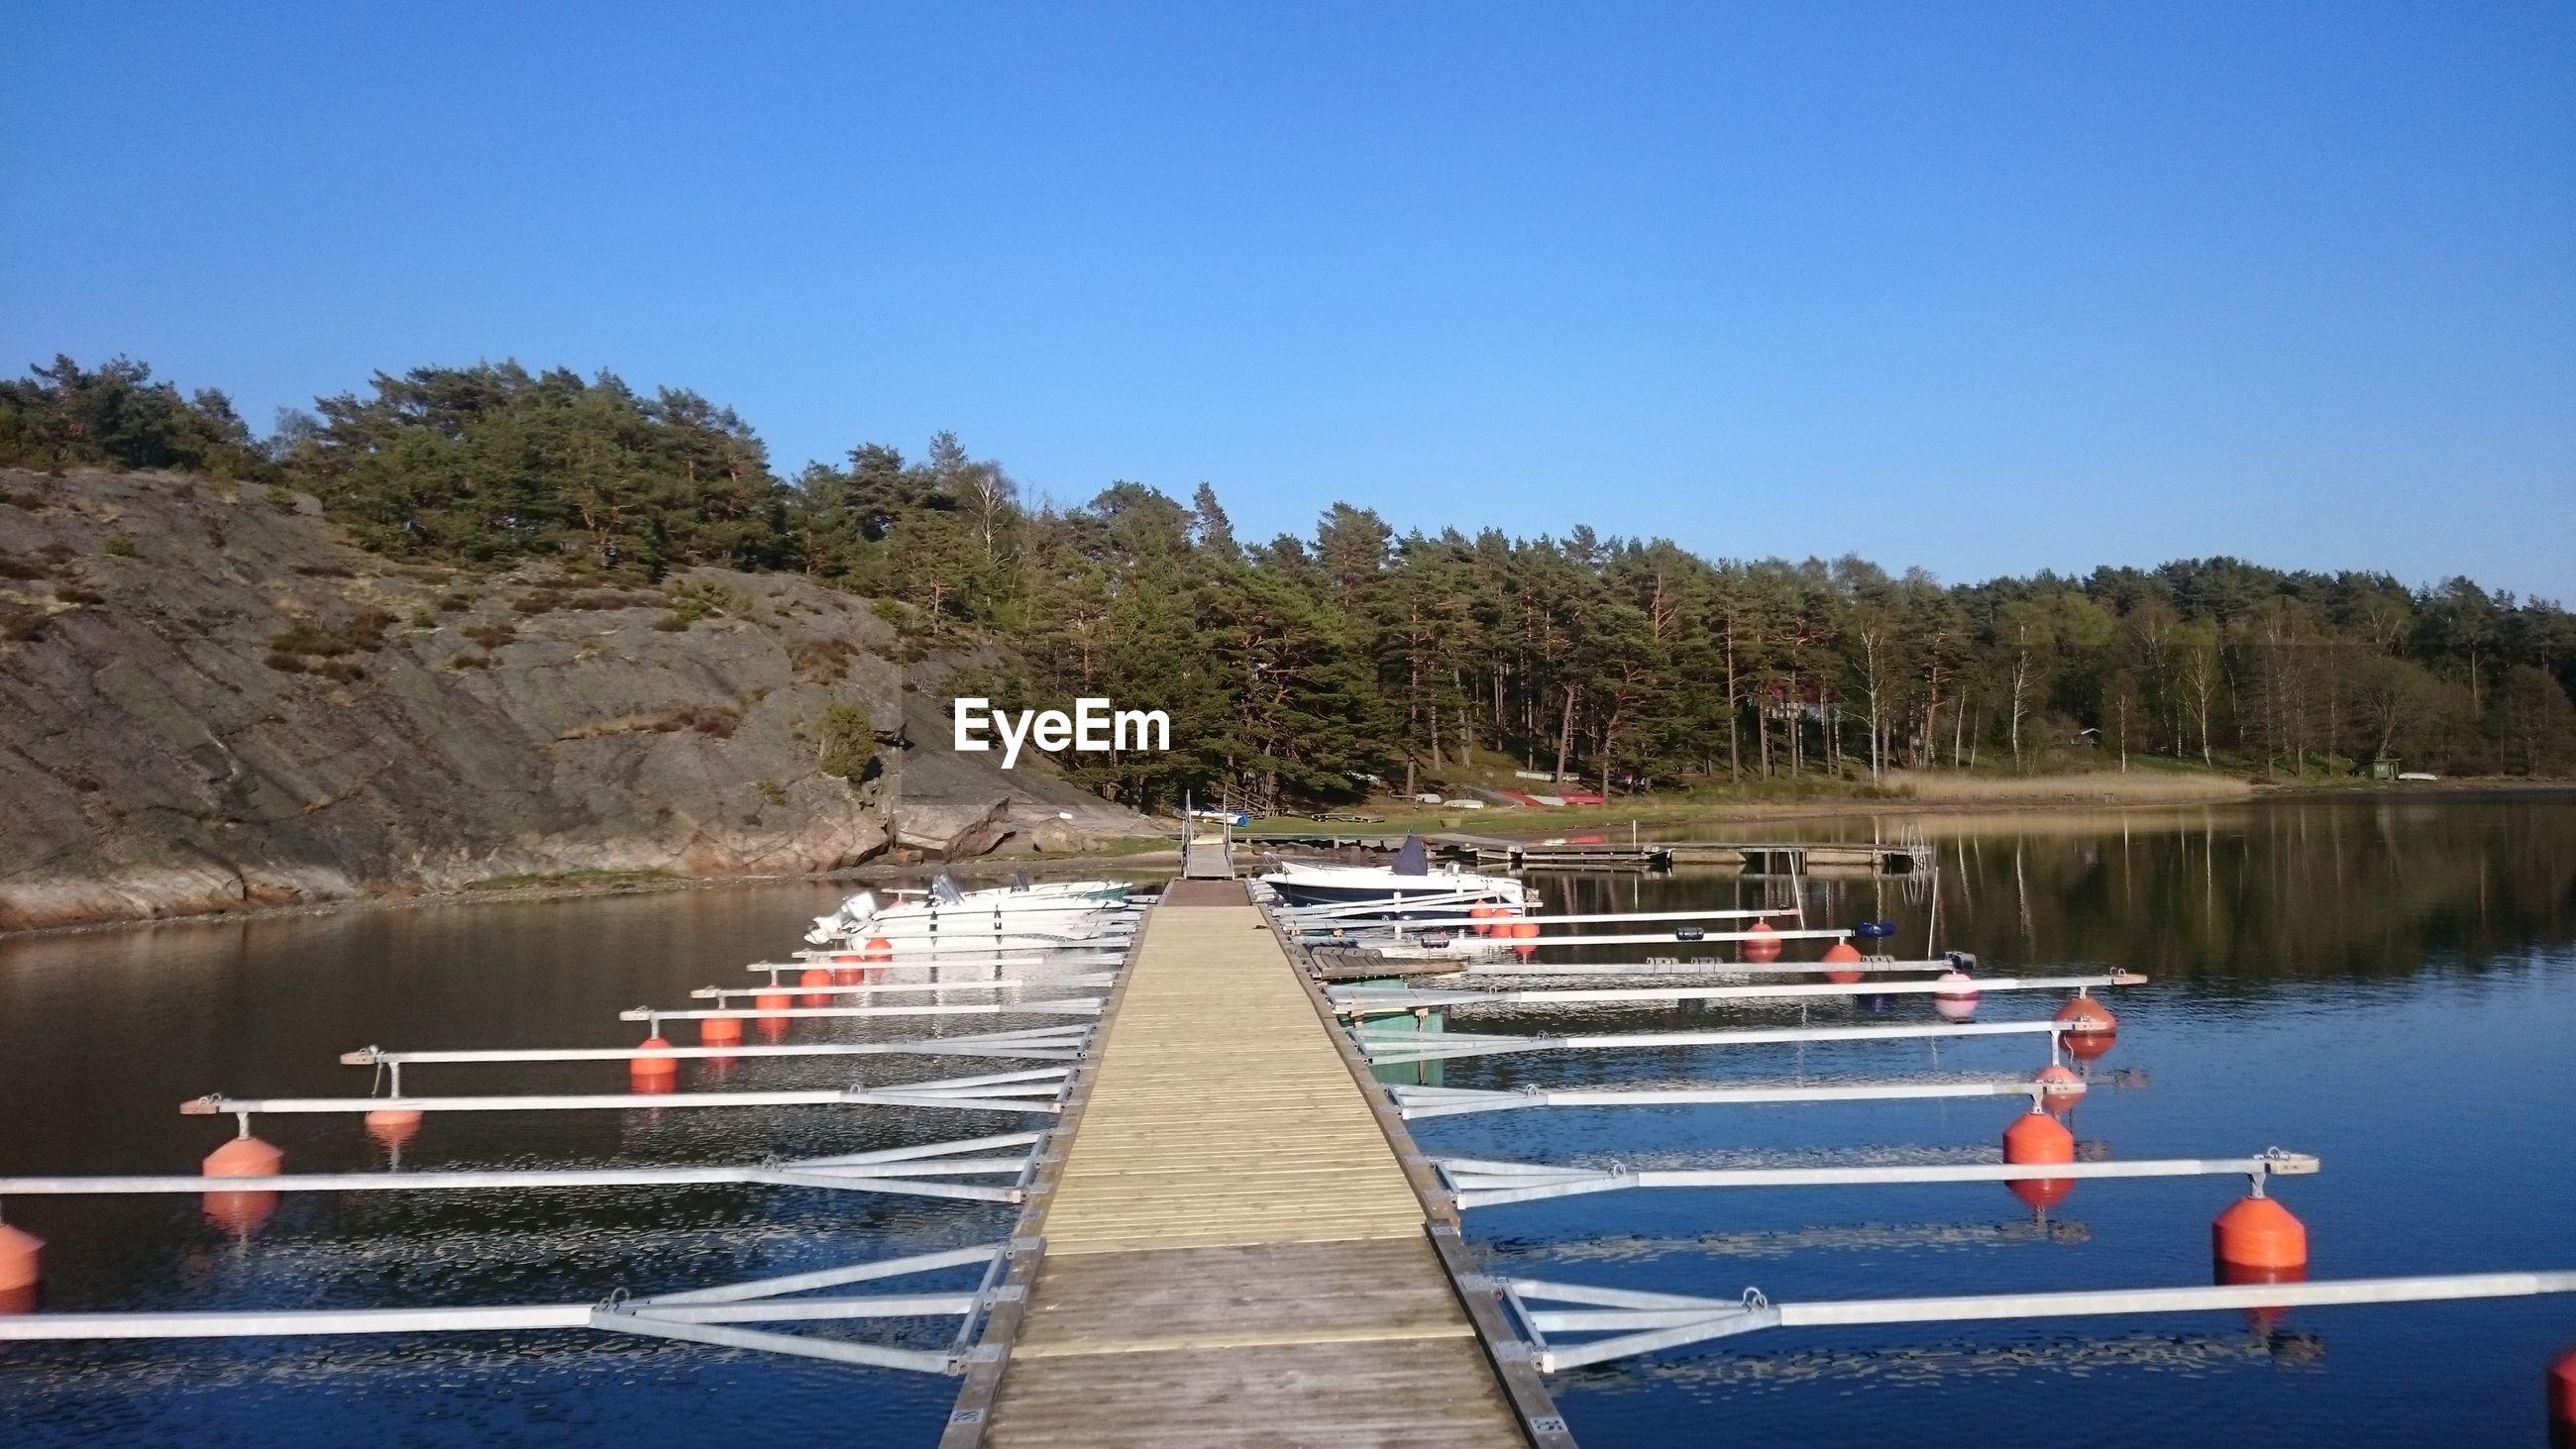 Pier amidst lake against clear blue sky